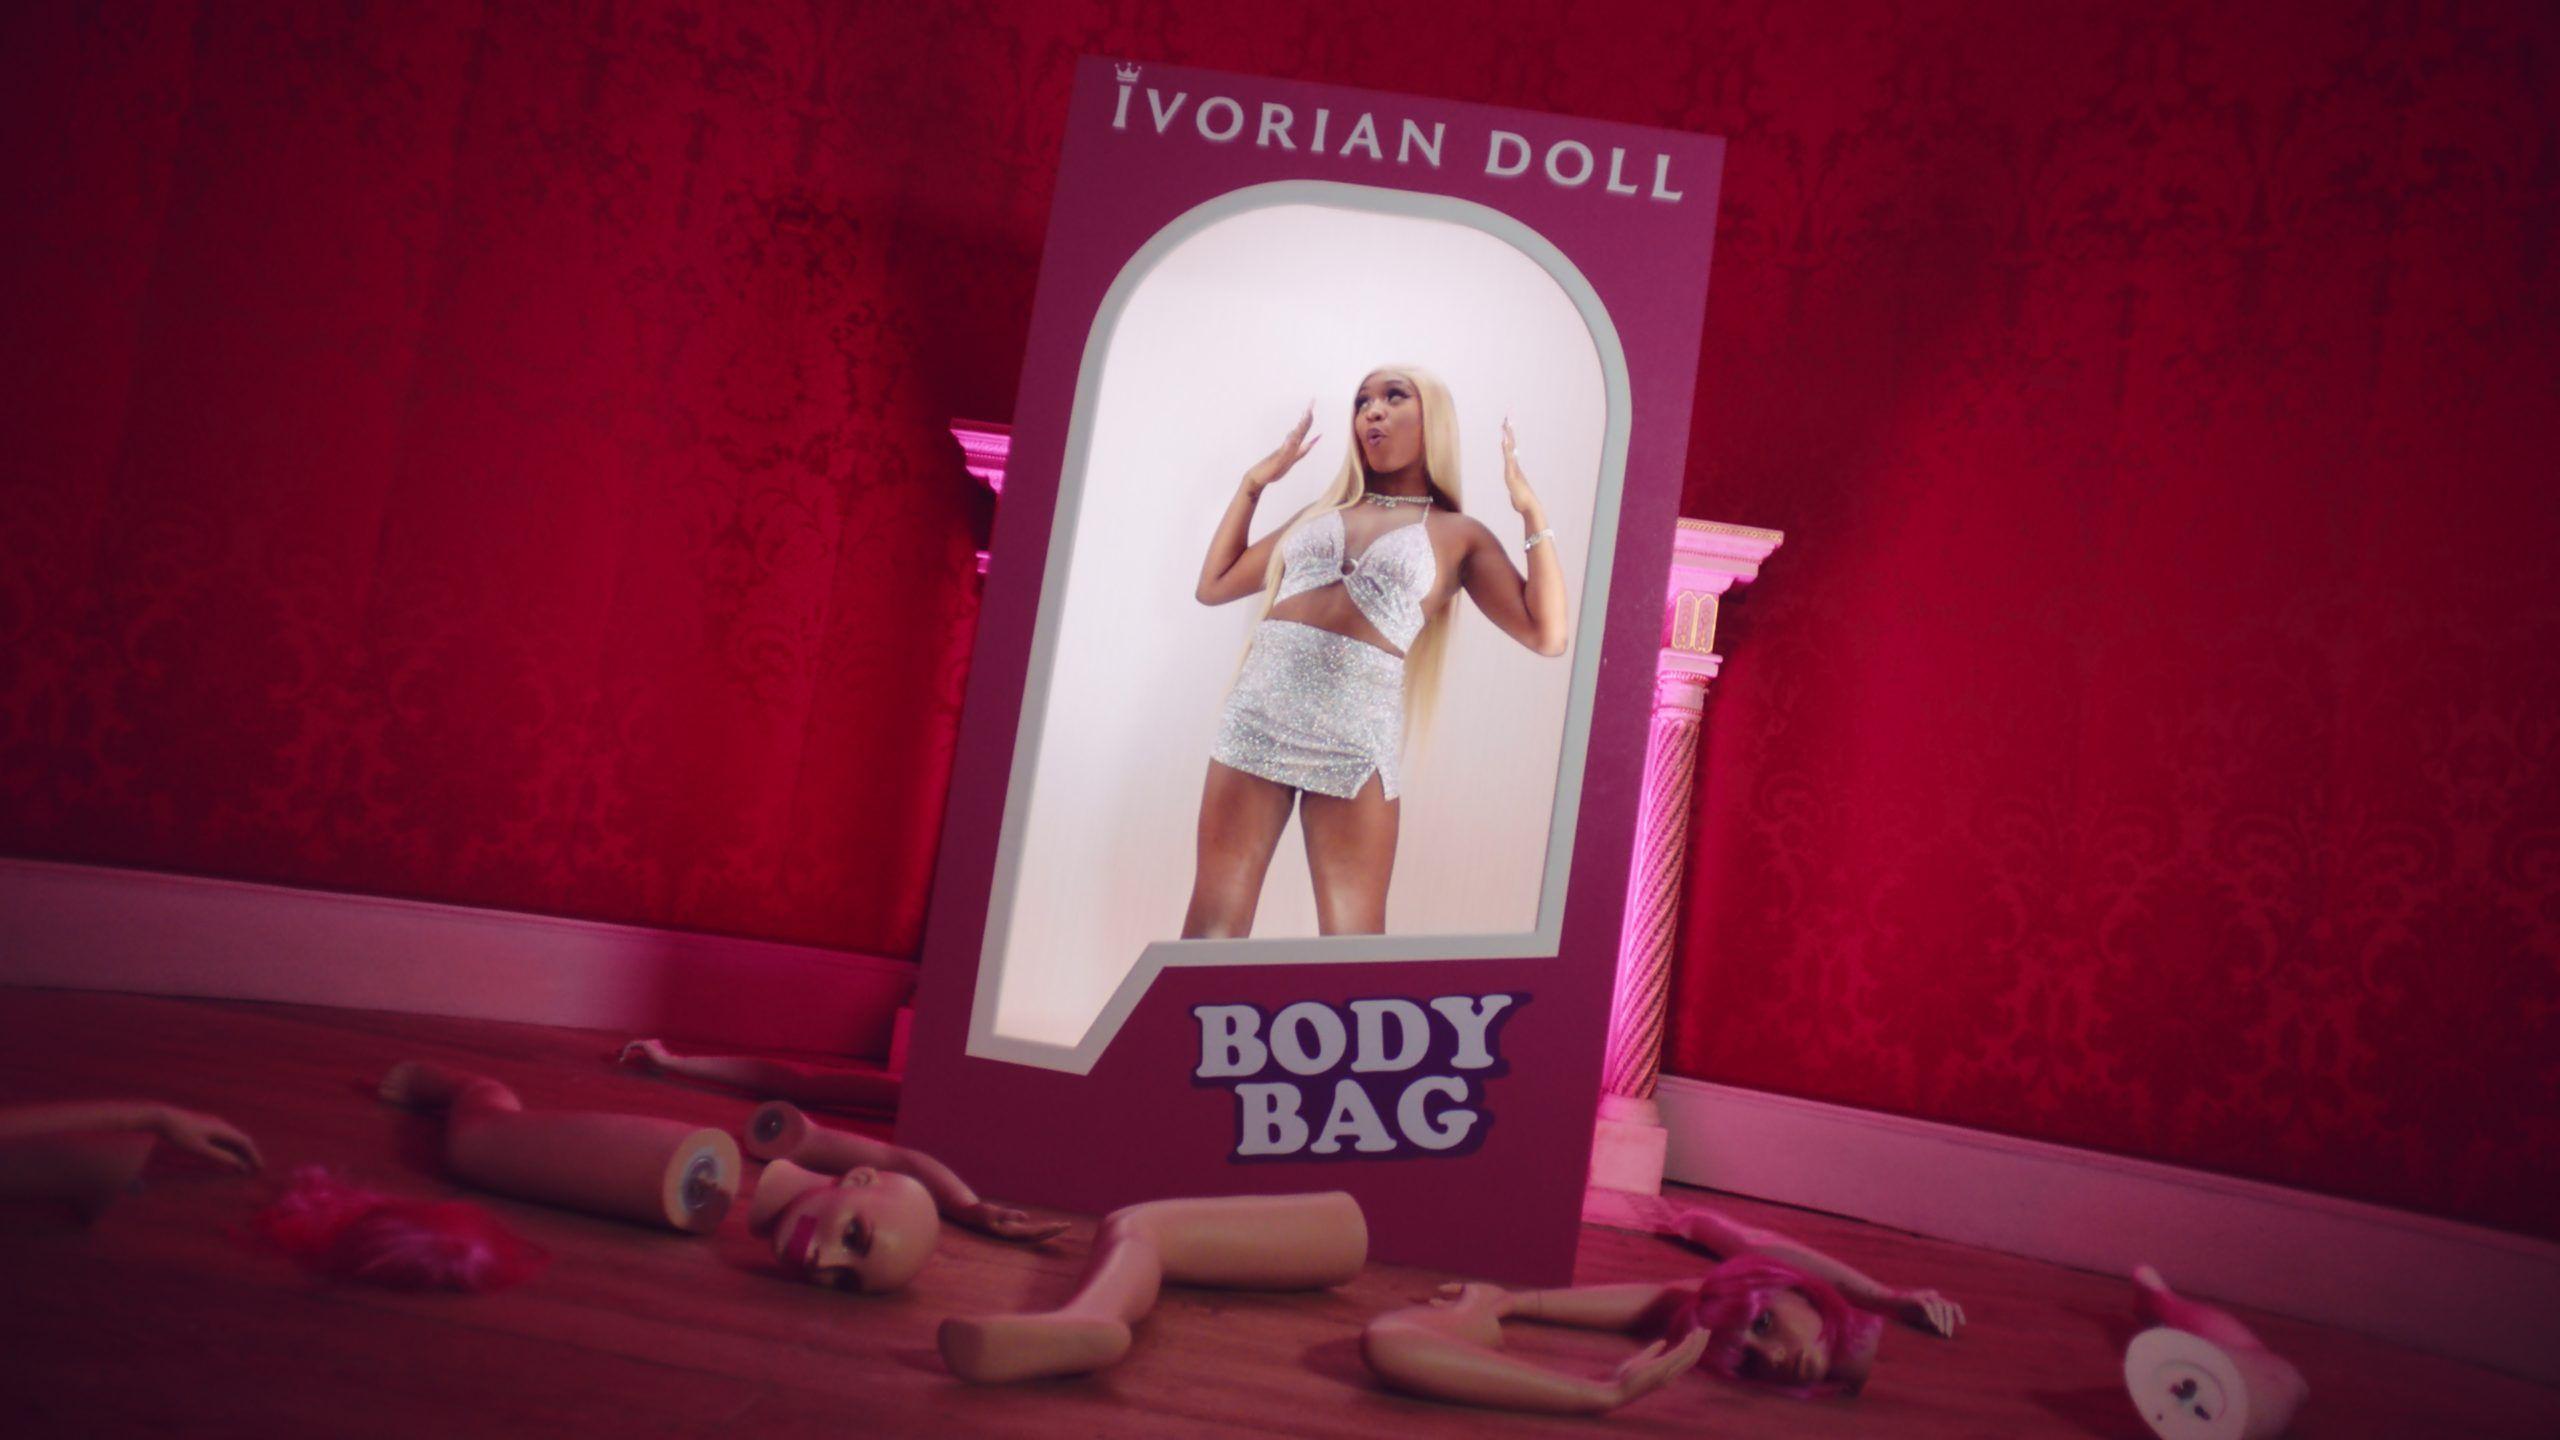 Ivorian Doll – Body Bag